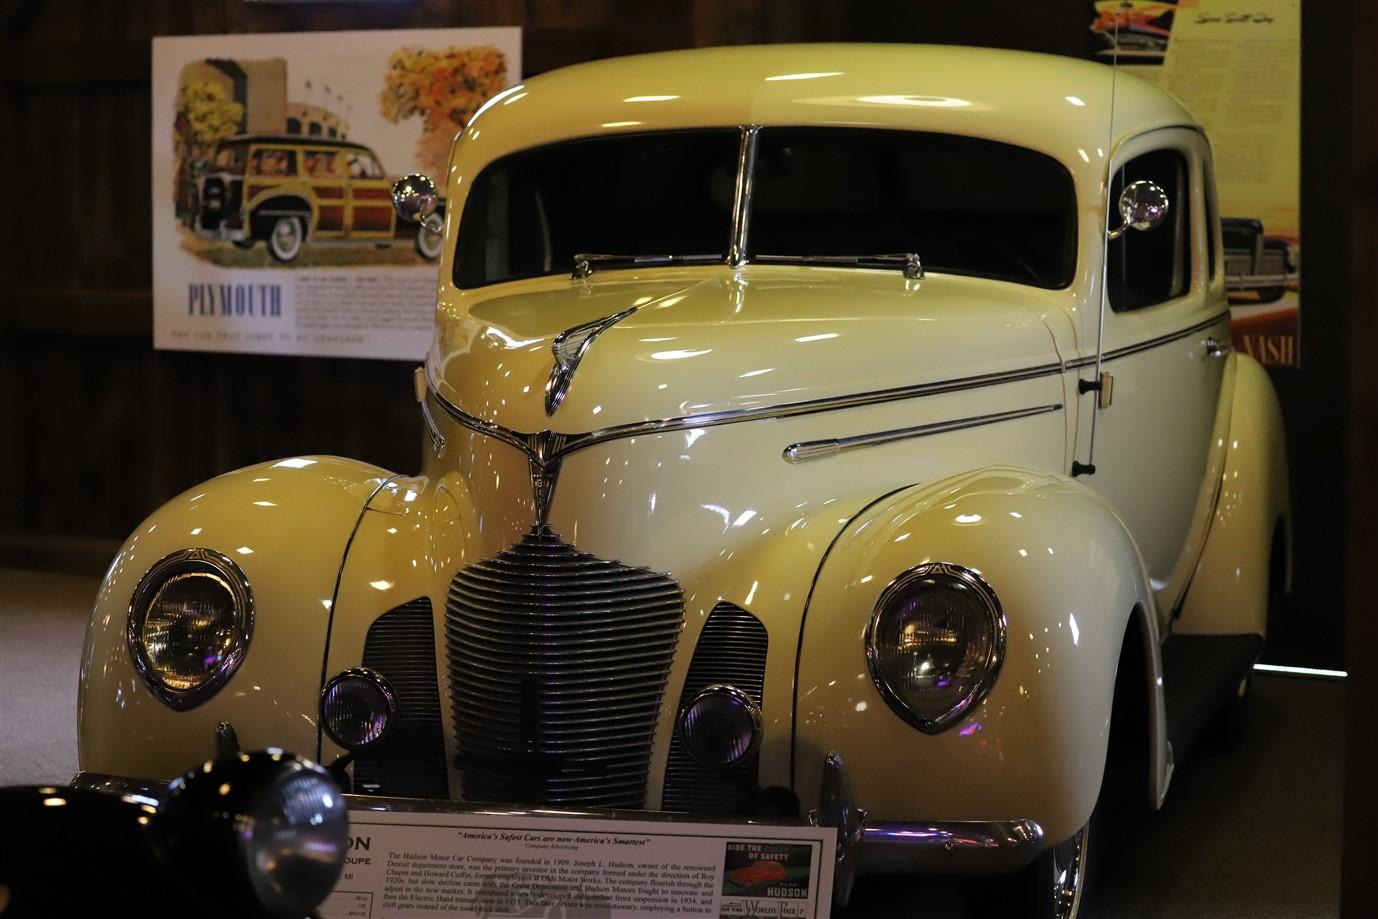 2018 09 03 295 Hickory Corners MI Gilmore Car Museum.jpg